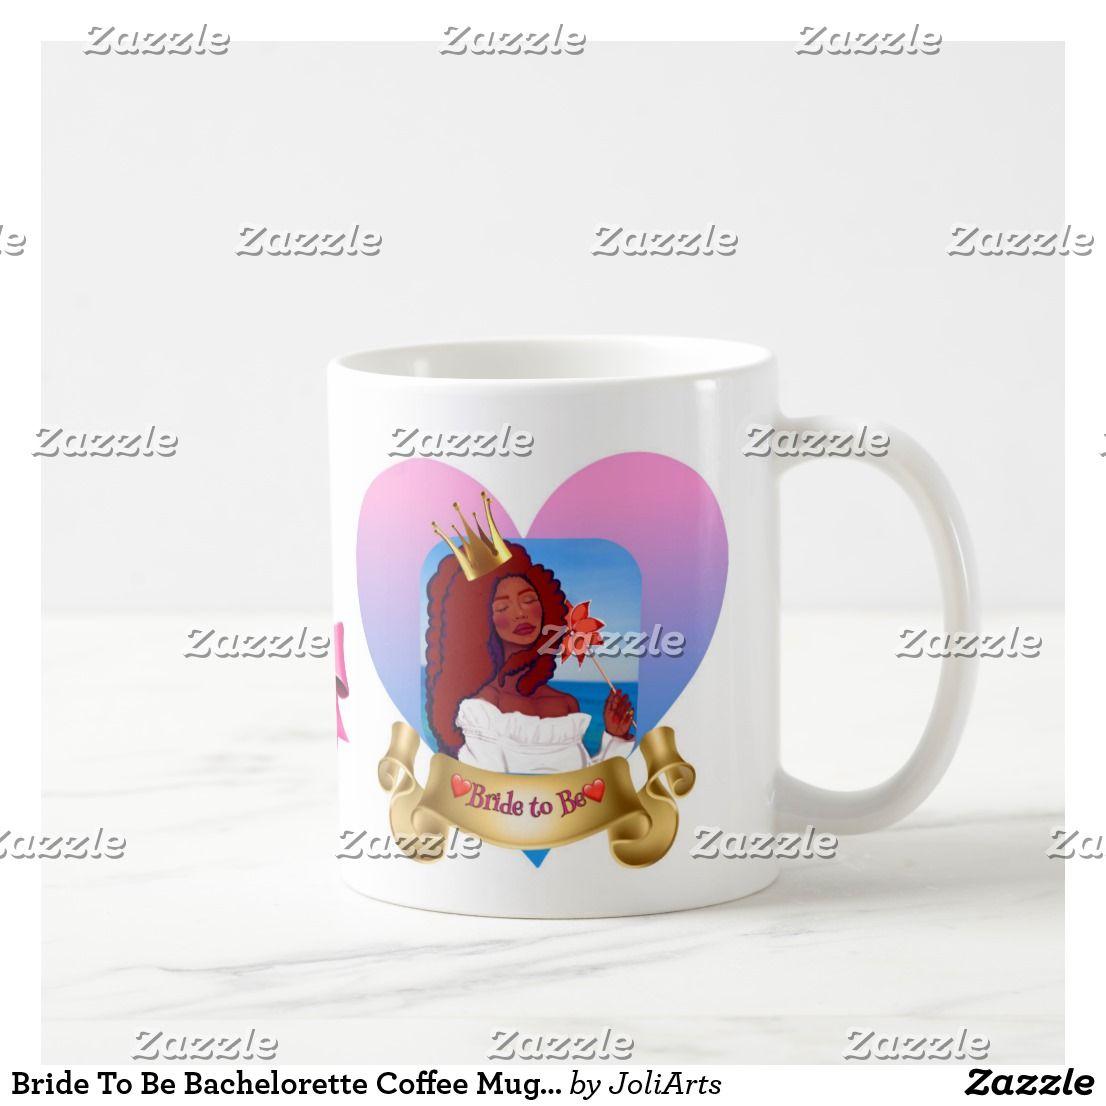 Bride to be bachelorette coffee mug original art coffee